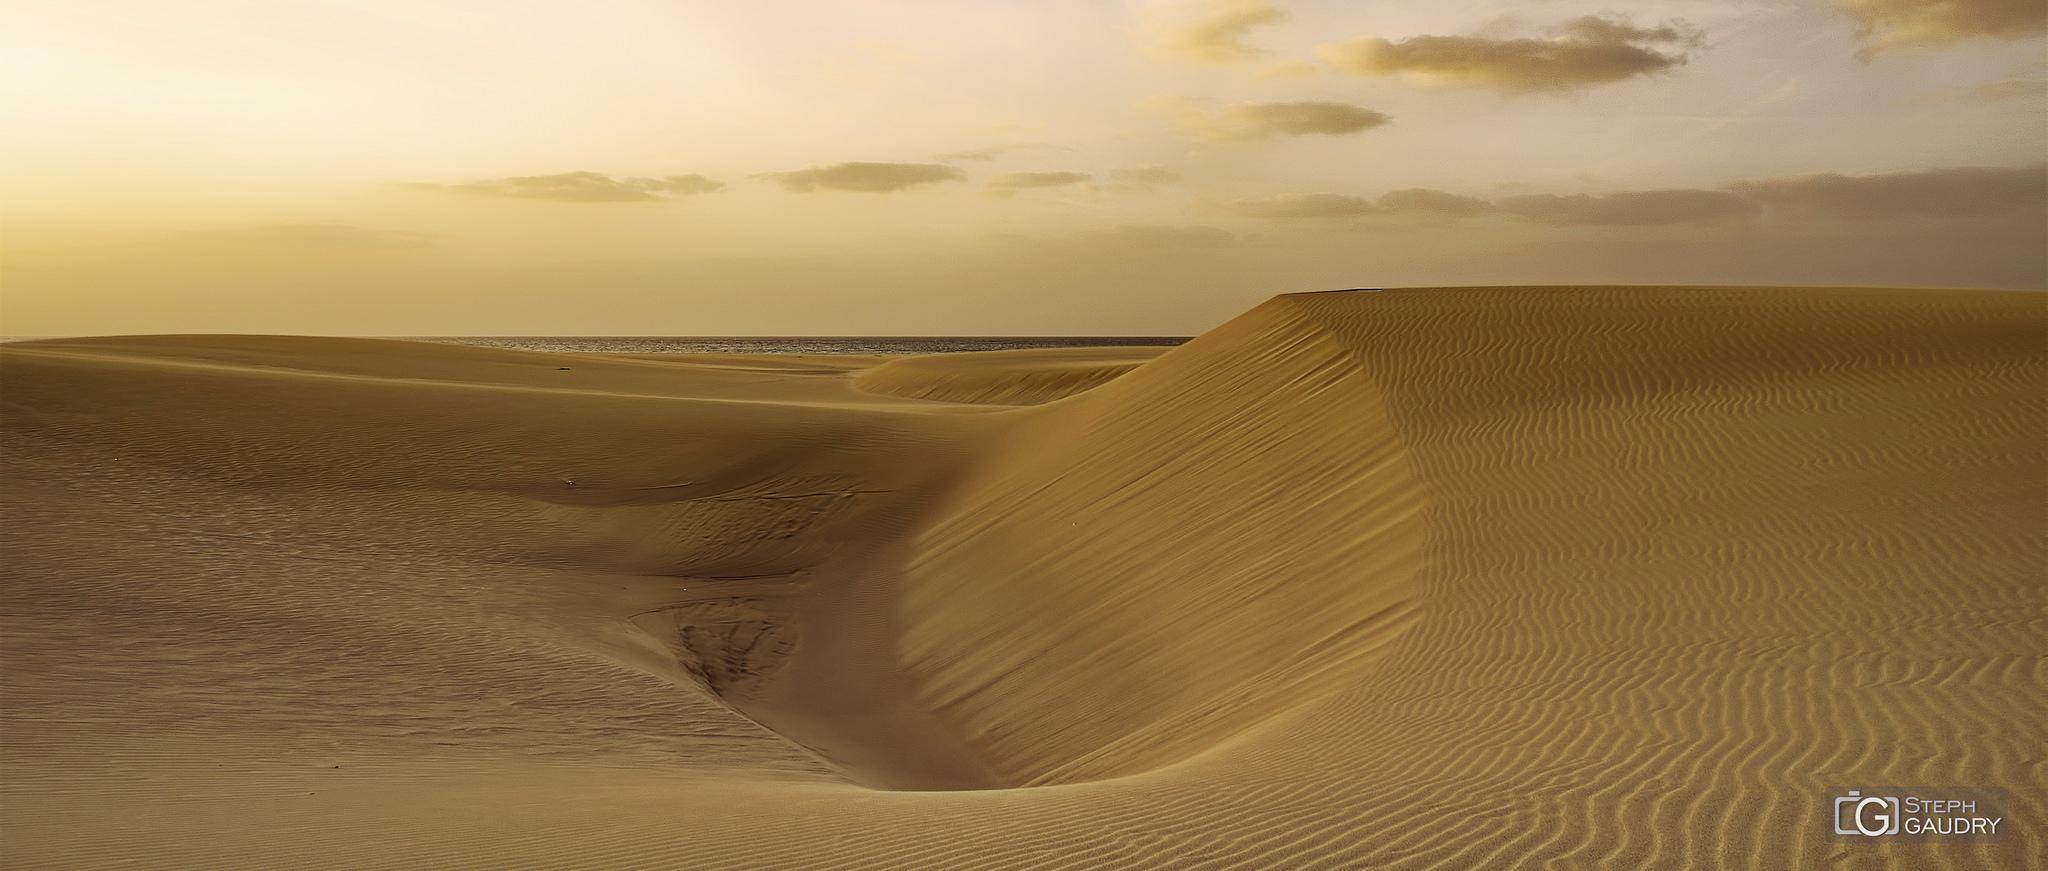 La Grande Fosse de Carkoon (Tatooine) [Click to start slideshow]